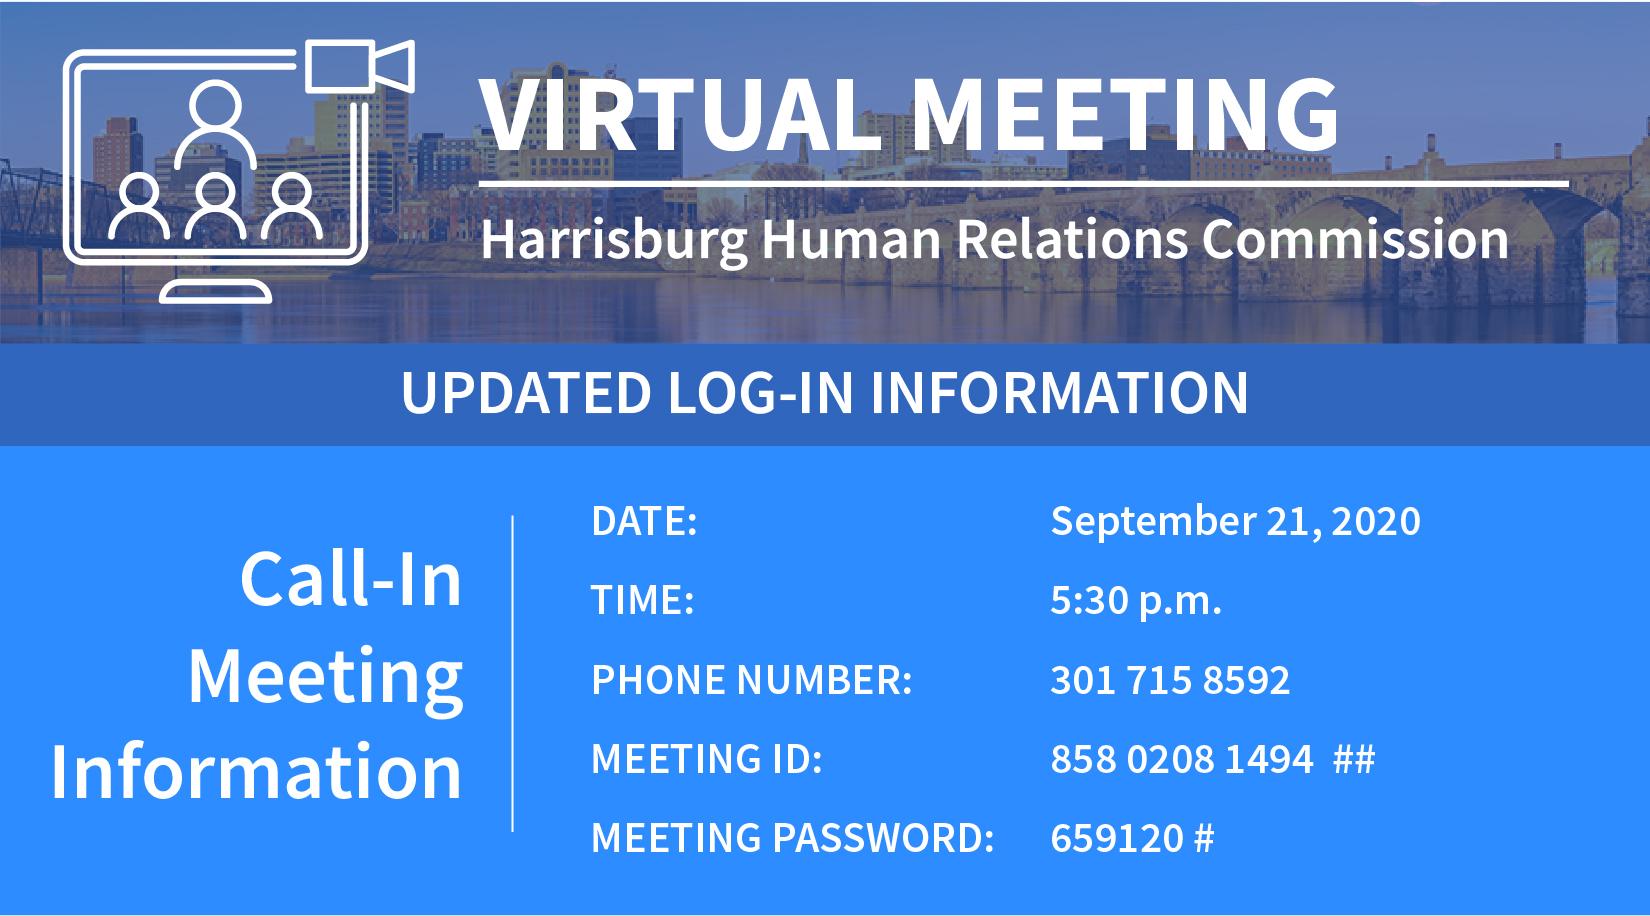 HHRC Meeting